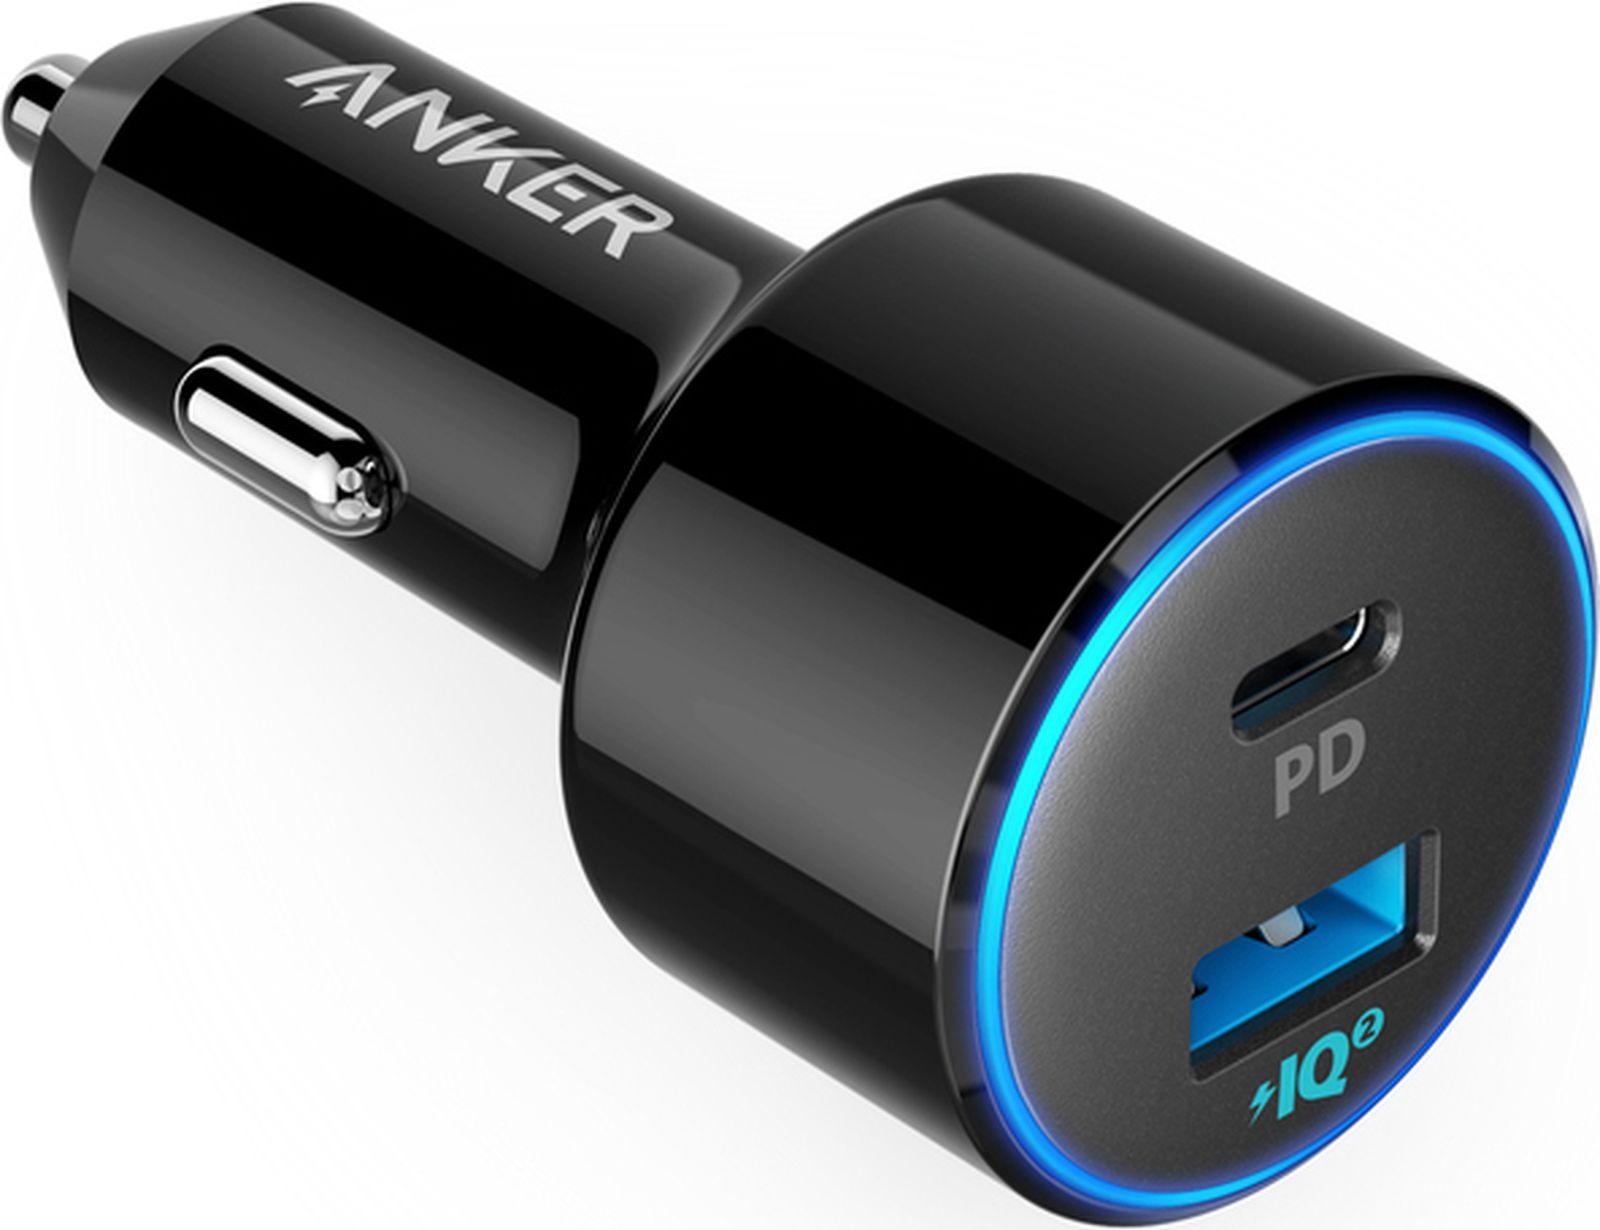 Фото - Автомобильное зарядное устройство Anker PowerDrive 2 PD with 1 PD and 1 PIQ, черный автомобильное зарядное устройство anker powerdrive 2 a2212h11 black